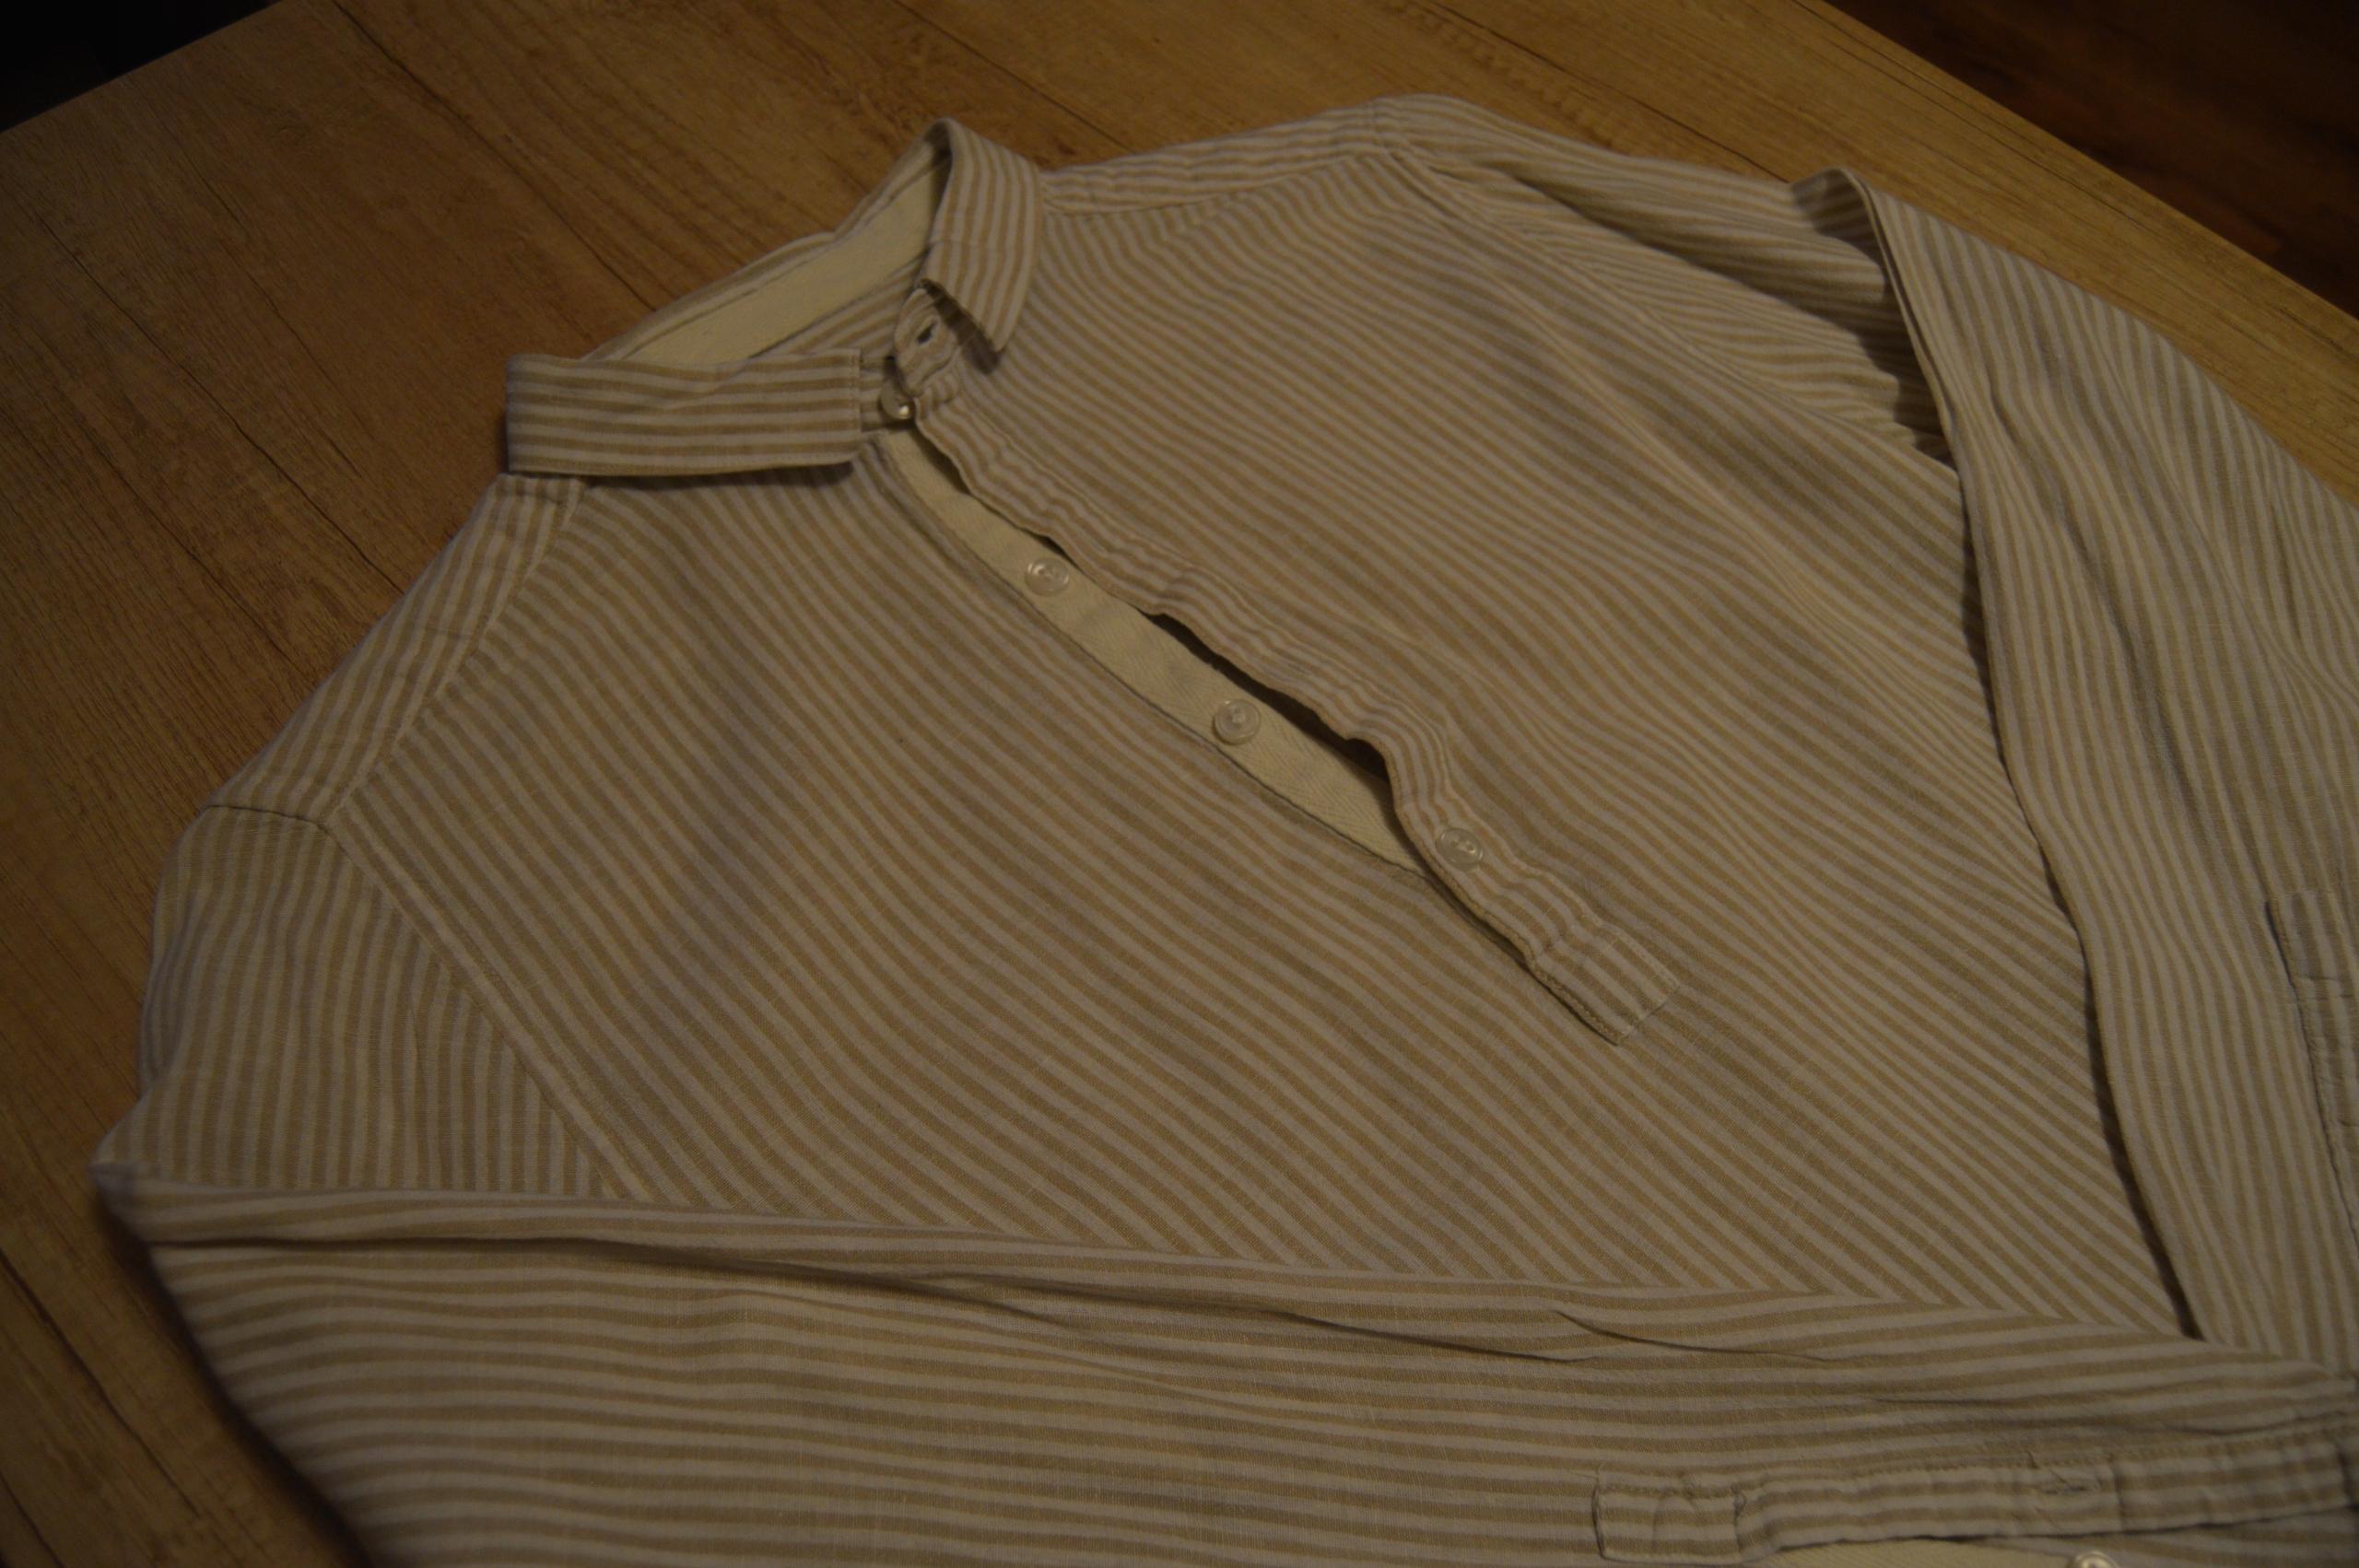 Koszula ekologiczna H&M SUPER OKAZJA BDB STAN